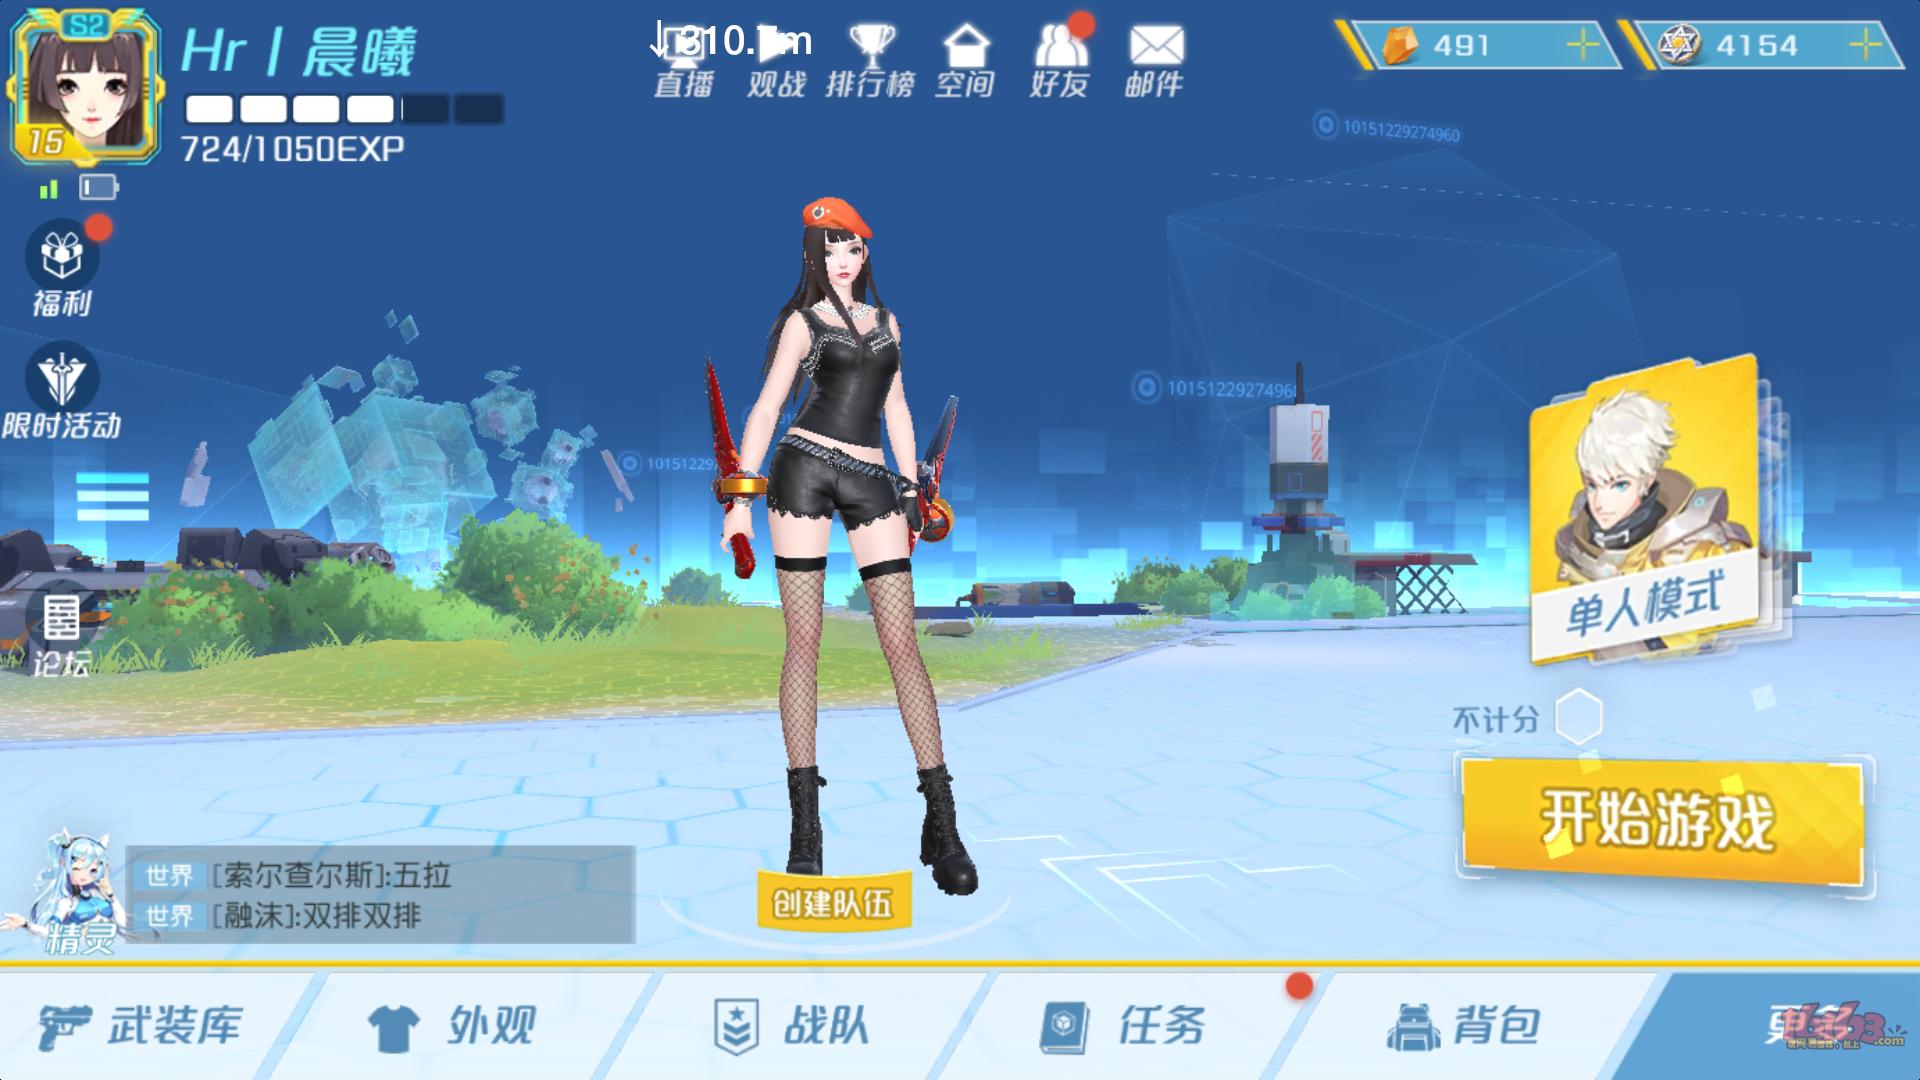 Screenshot_2018-04-23-21-01-43-800_孤岛先锋.png